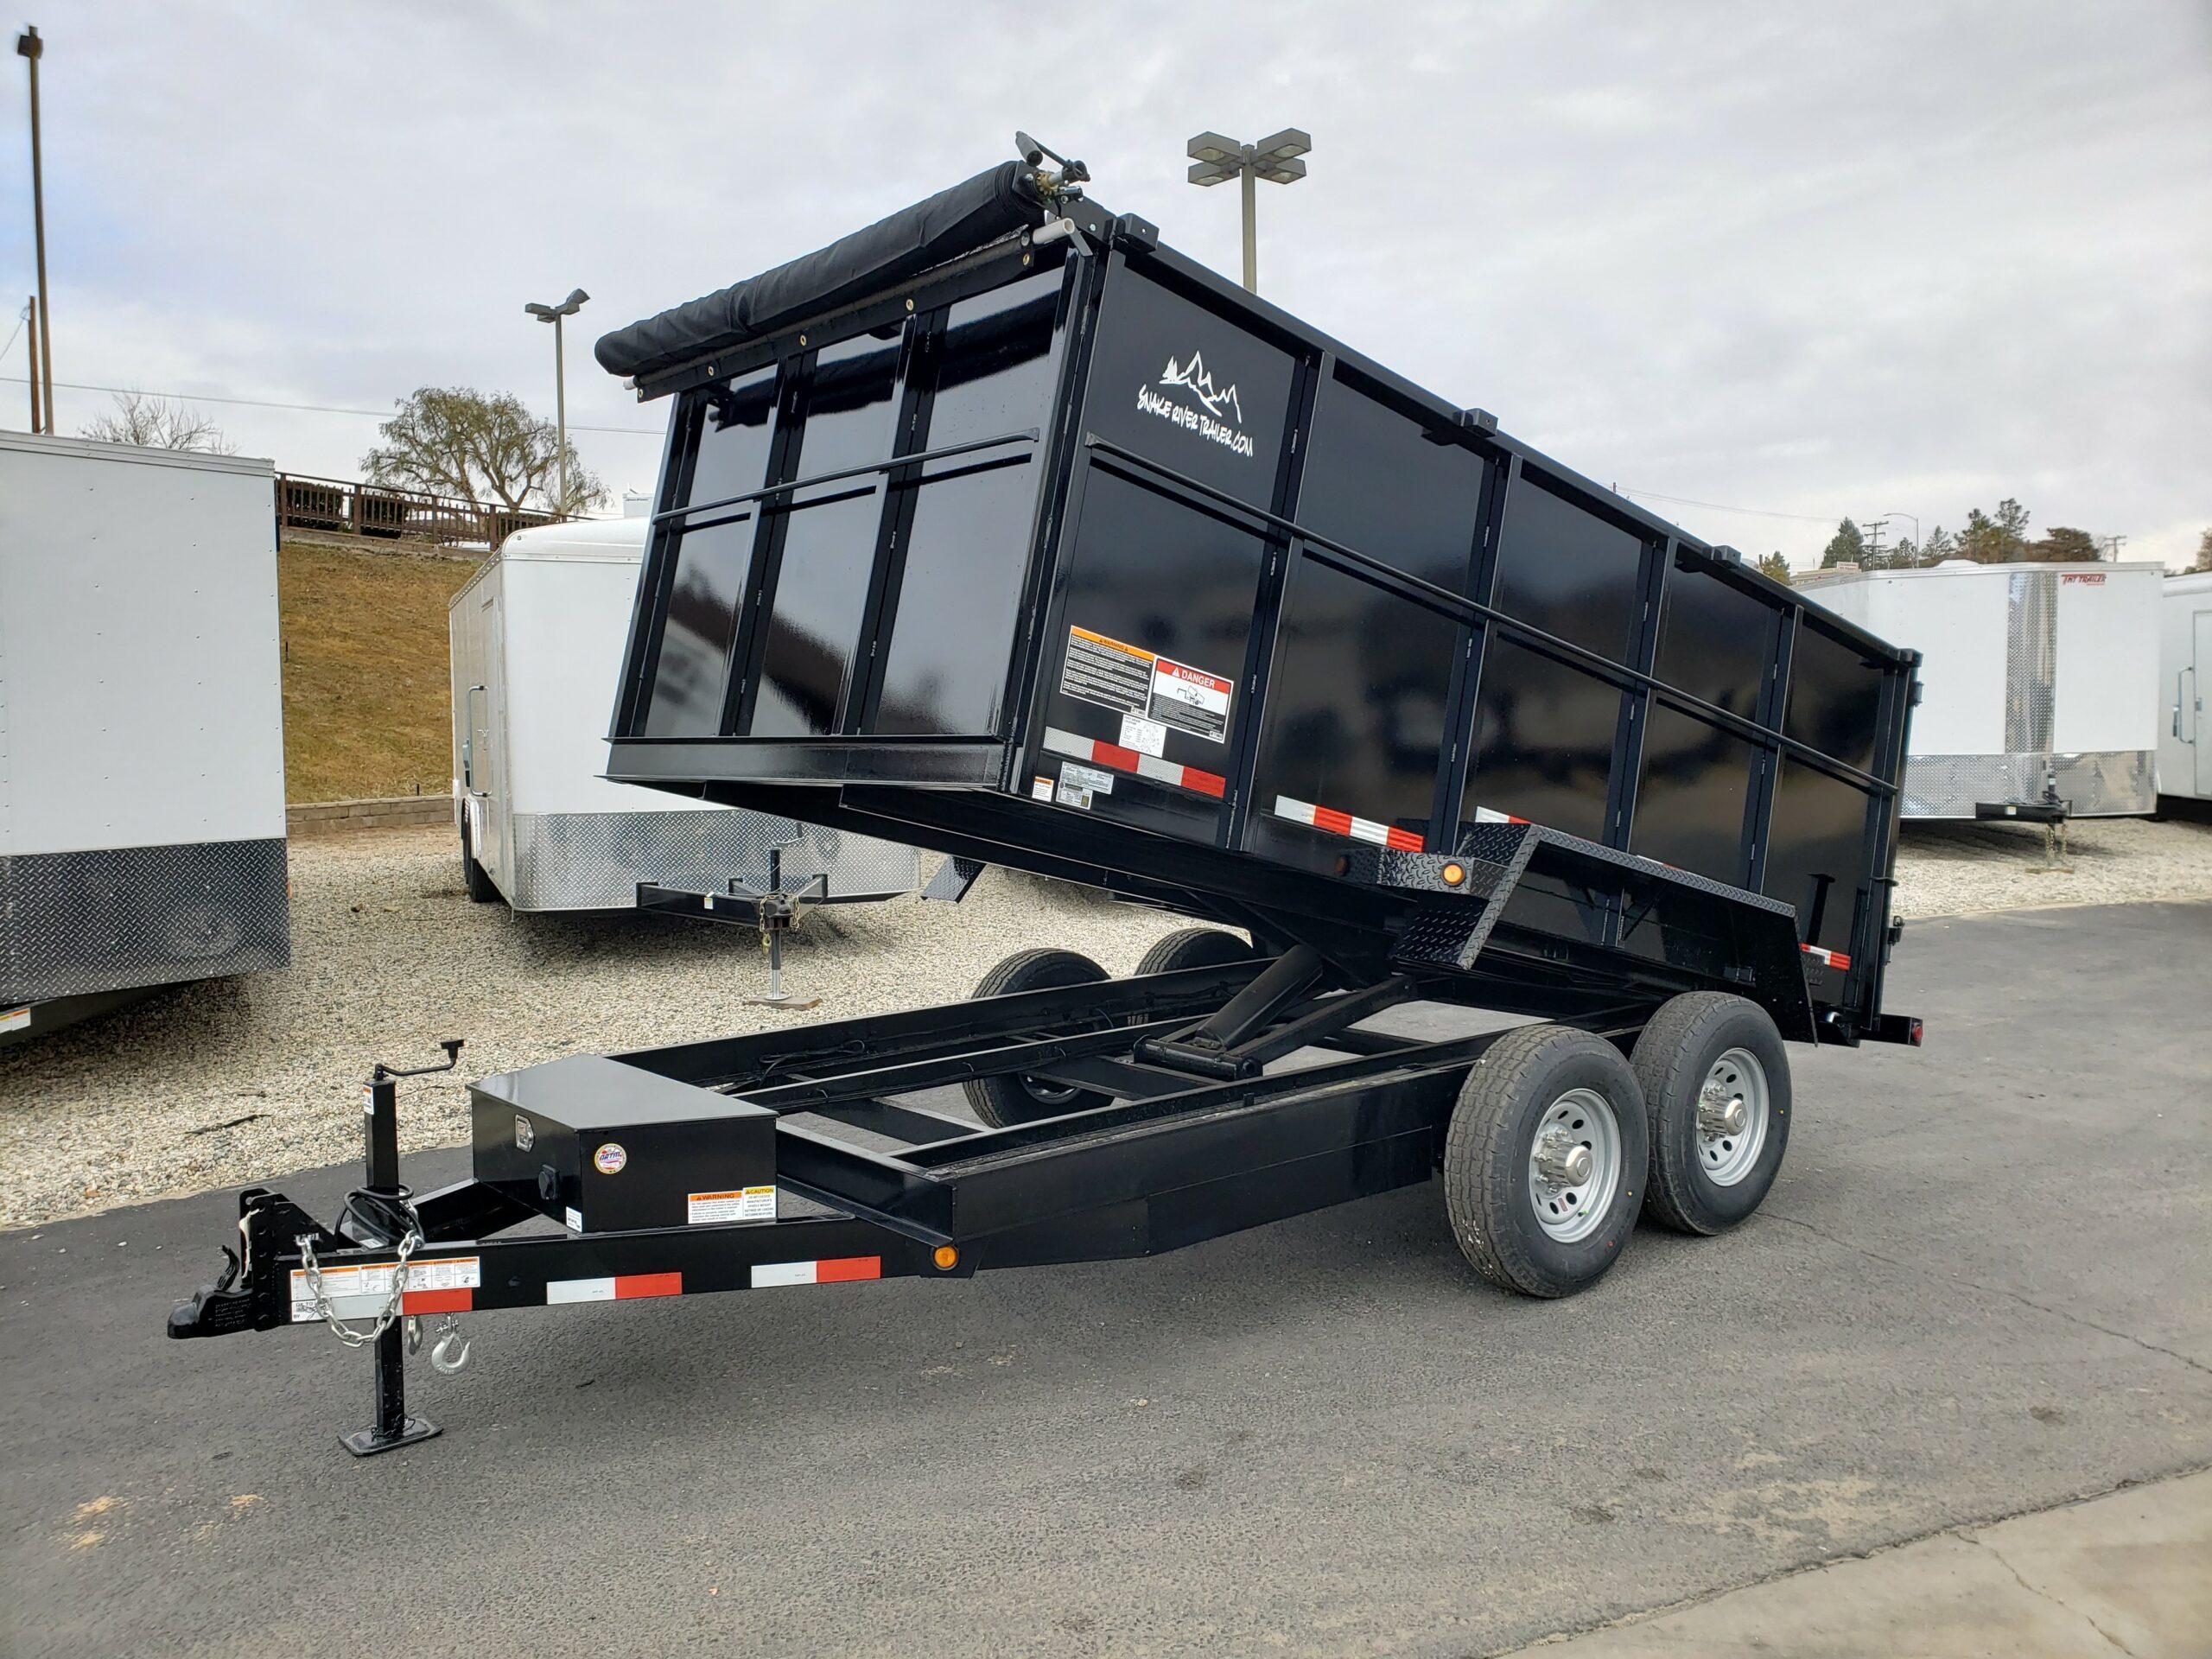 Snake River 7x14 Dump 4ft - Driver side front 3/4 view dump bed up